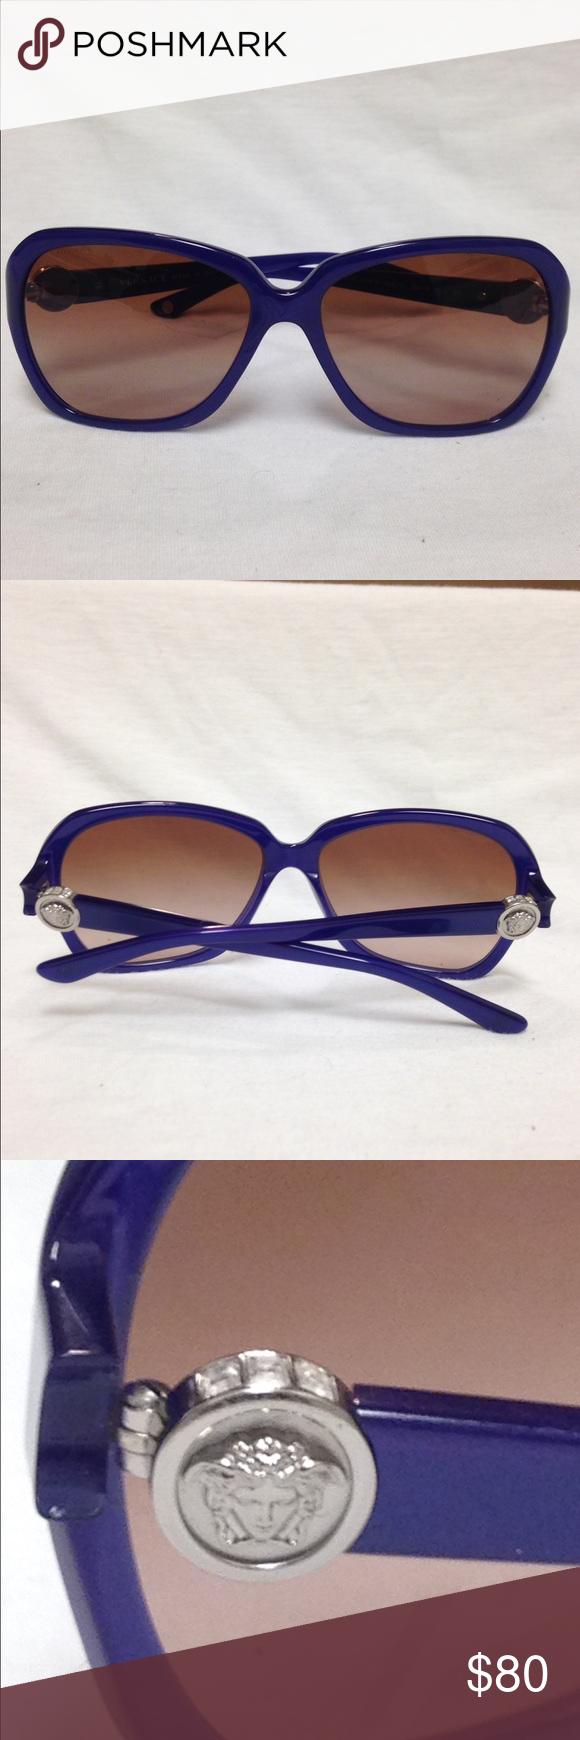 1f98911b04c8d Versace MOD 4218-B sunglasses Gorgeous Versace MOD 4218-B sunglasses w   medusa head